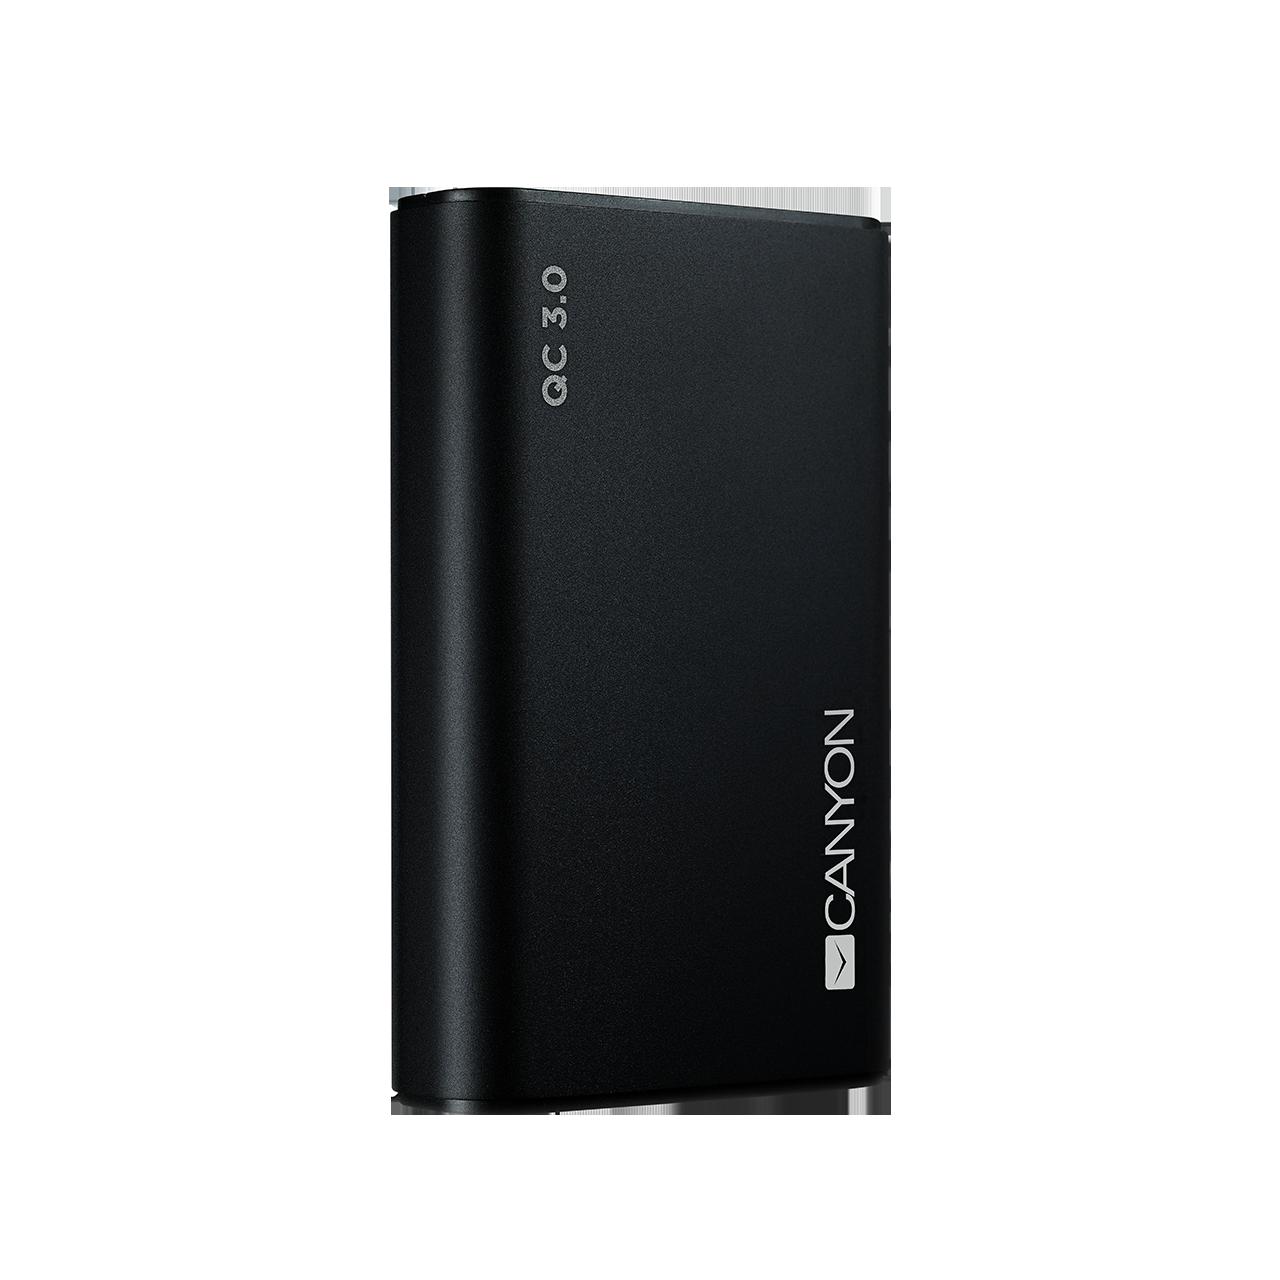 Baterie Externa Canyon CND-TPBQC10B Quick Charge 3.0 10000mAh Negru